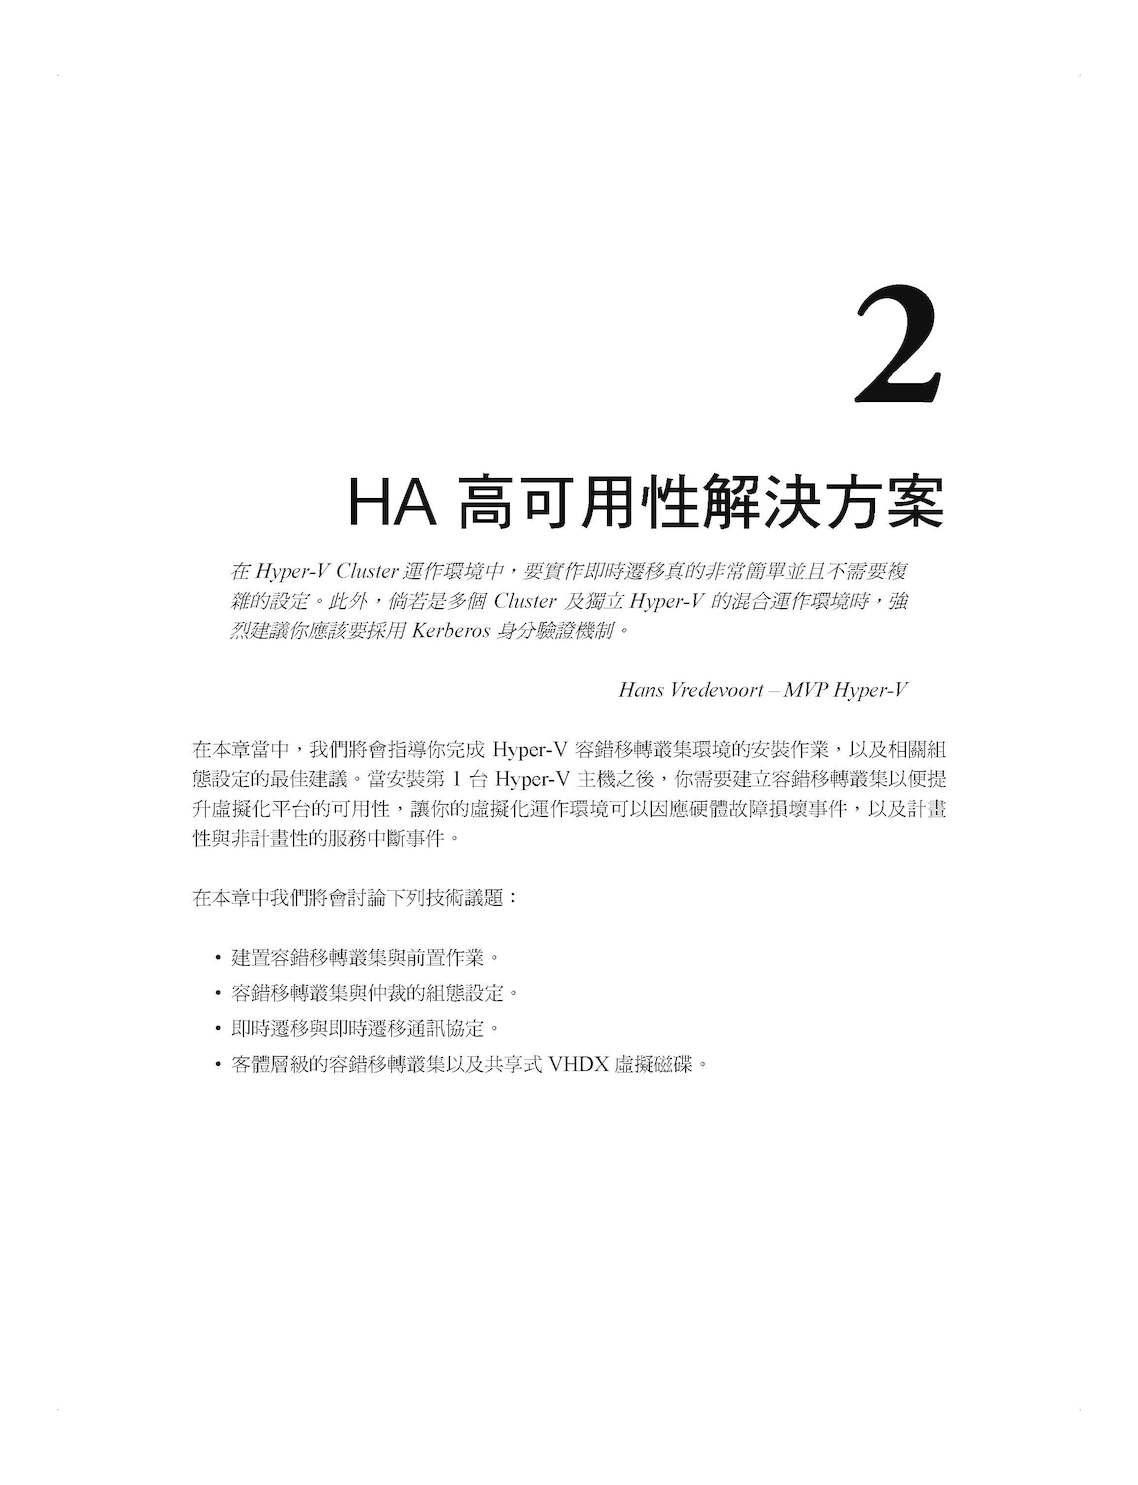 Hyper-V 最佳實踐:快速建置虛擬化解決方案 (Hyper-V Best Practices)-preview-2